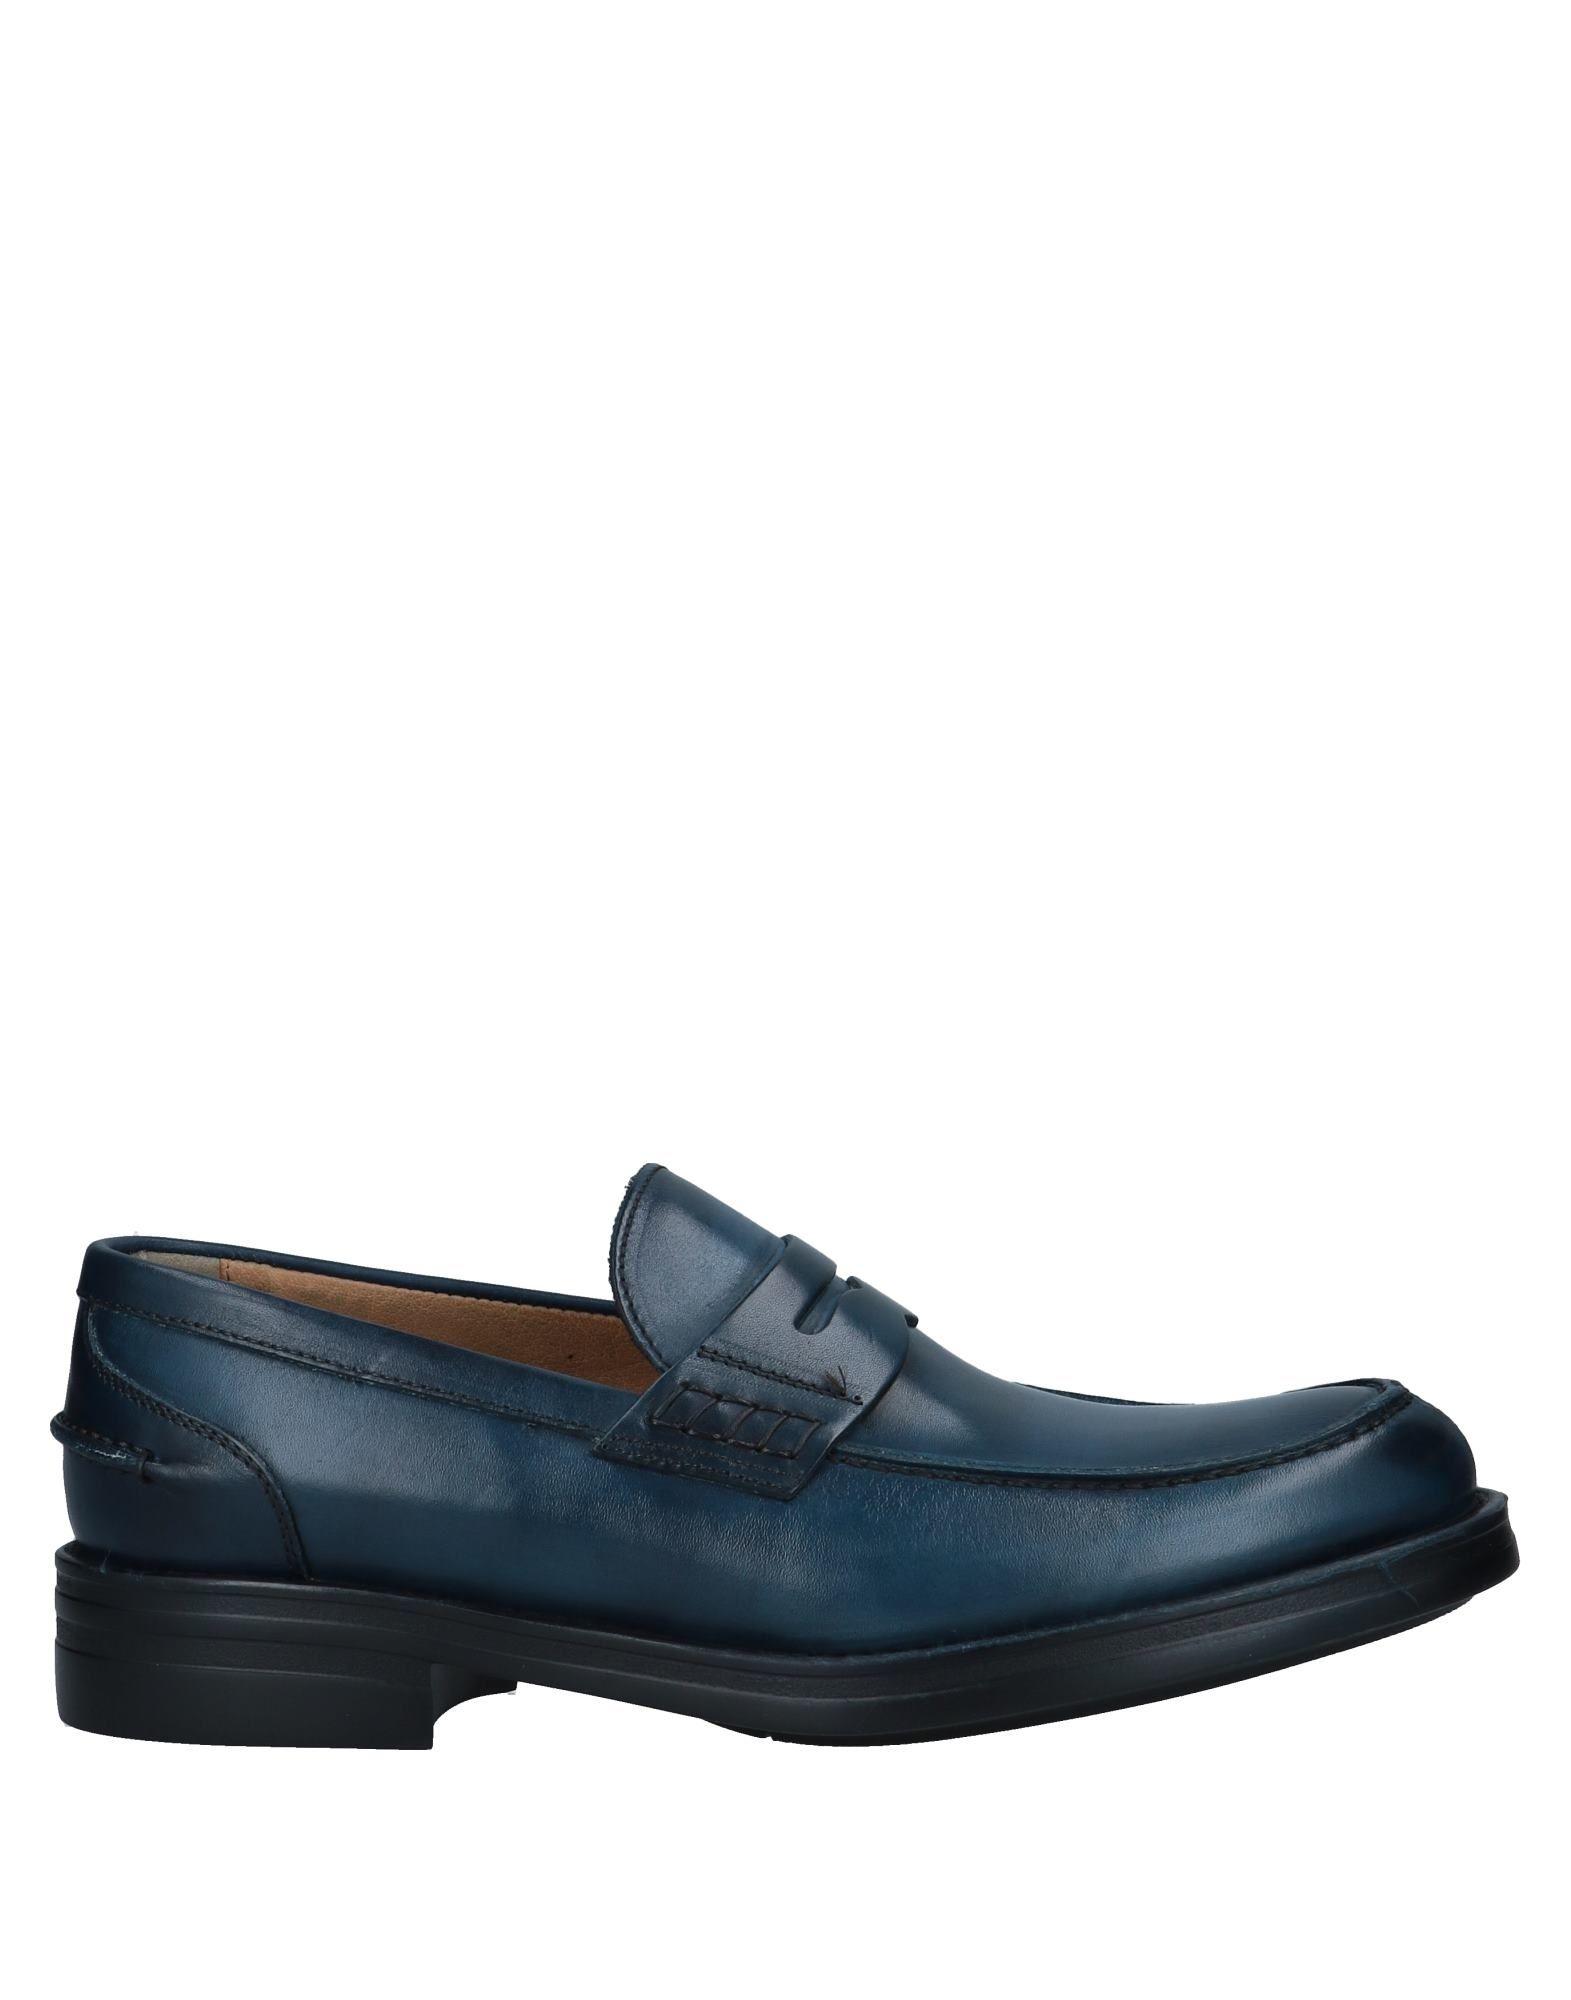 Baldinini Mokassins Herren  11554908QB Gute Qualität beliebte Schuhe